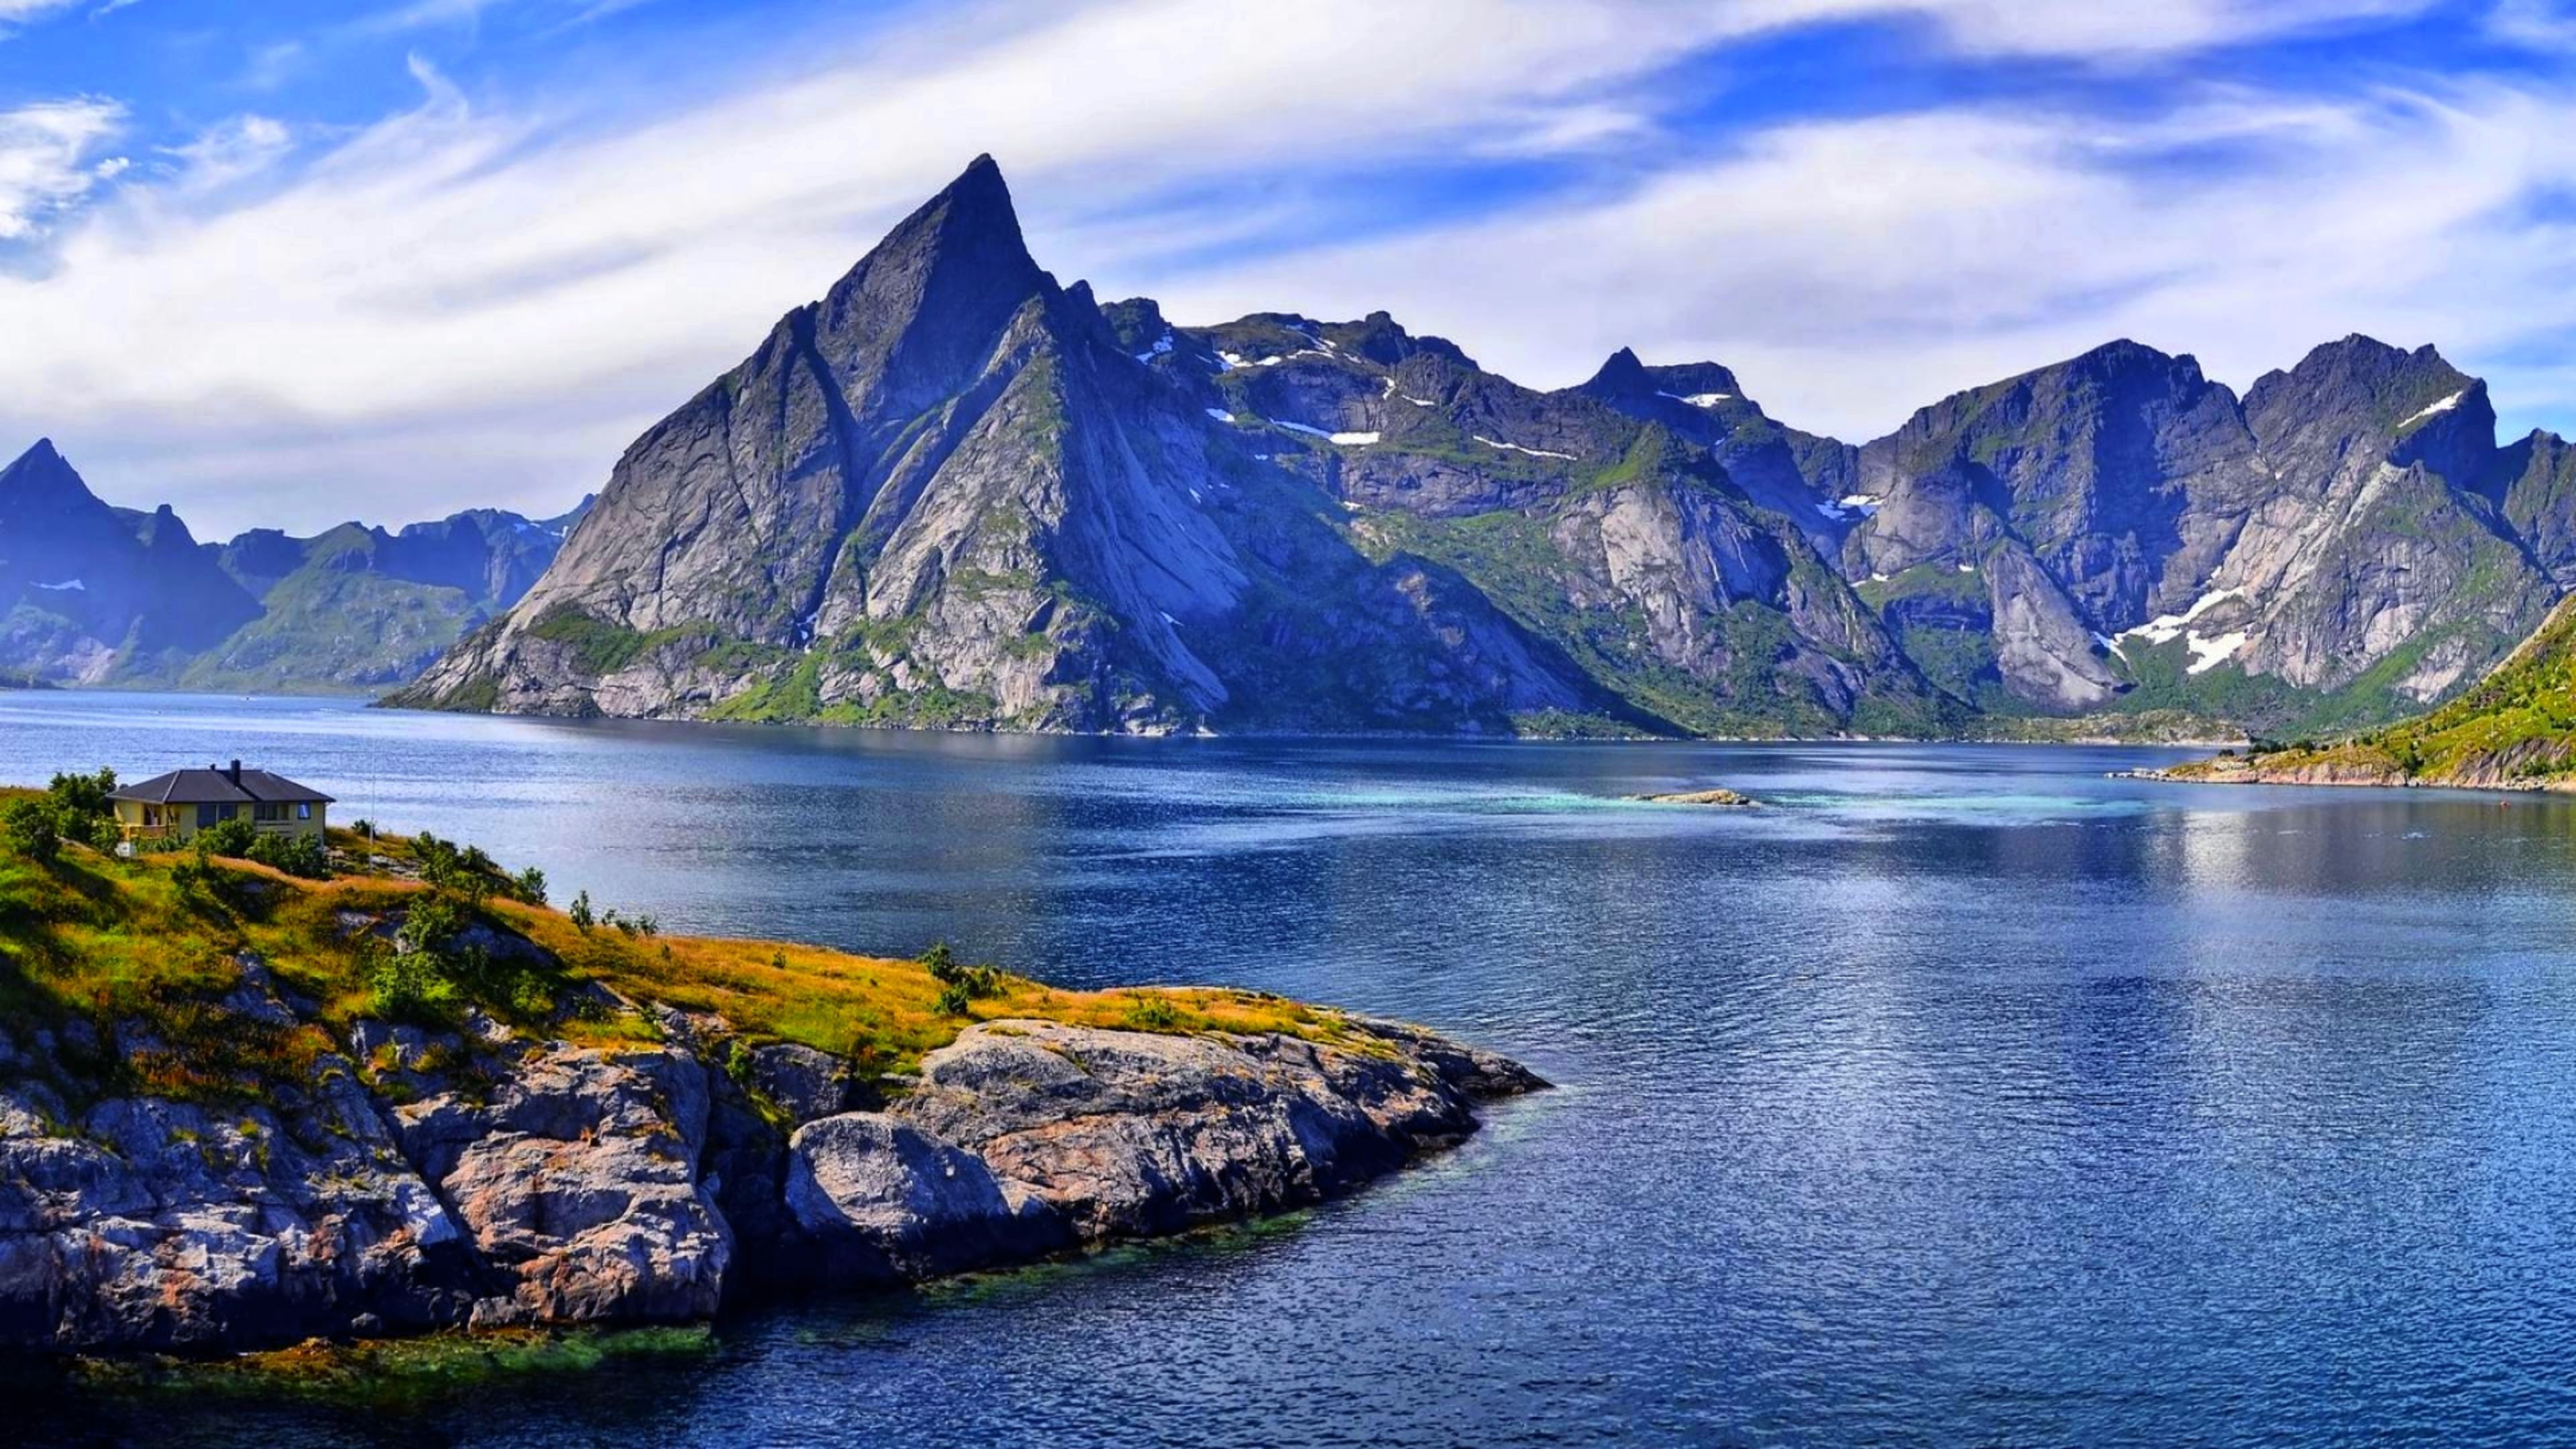 Top Download Mountains 4K wallpaper